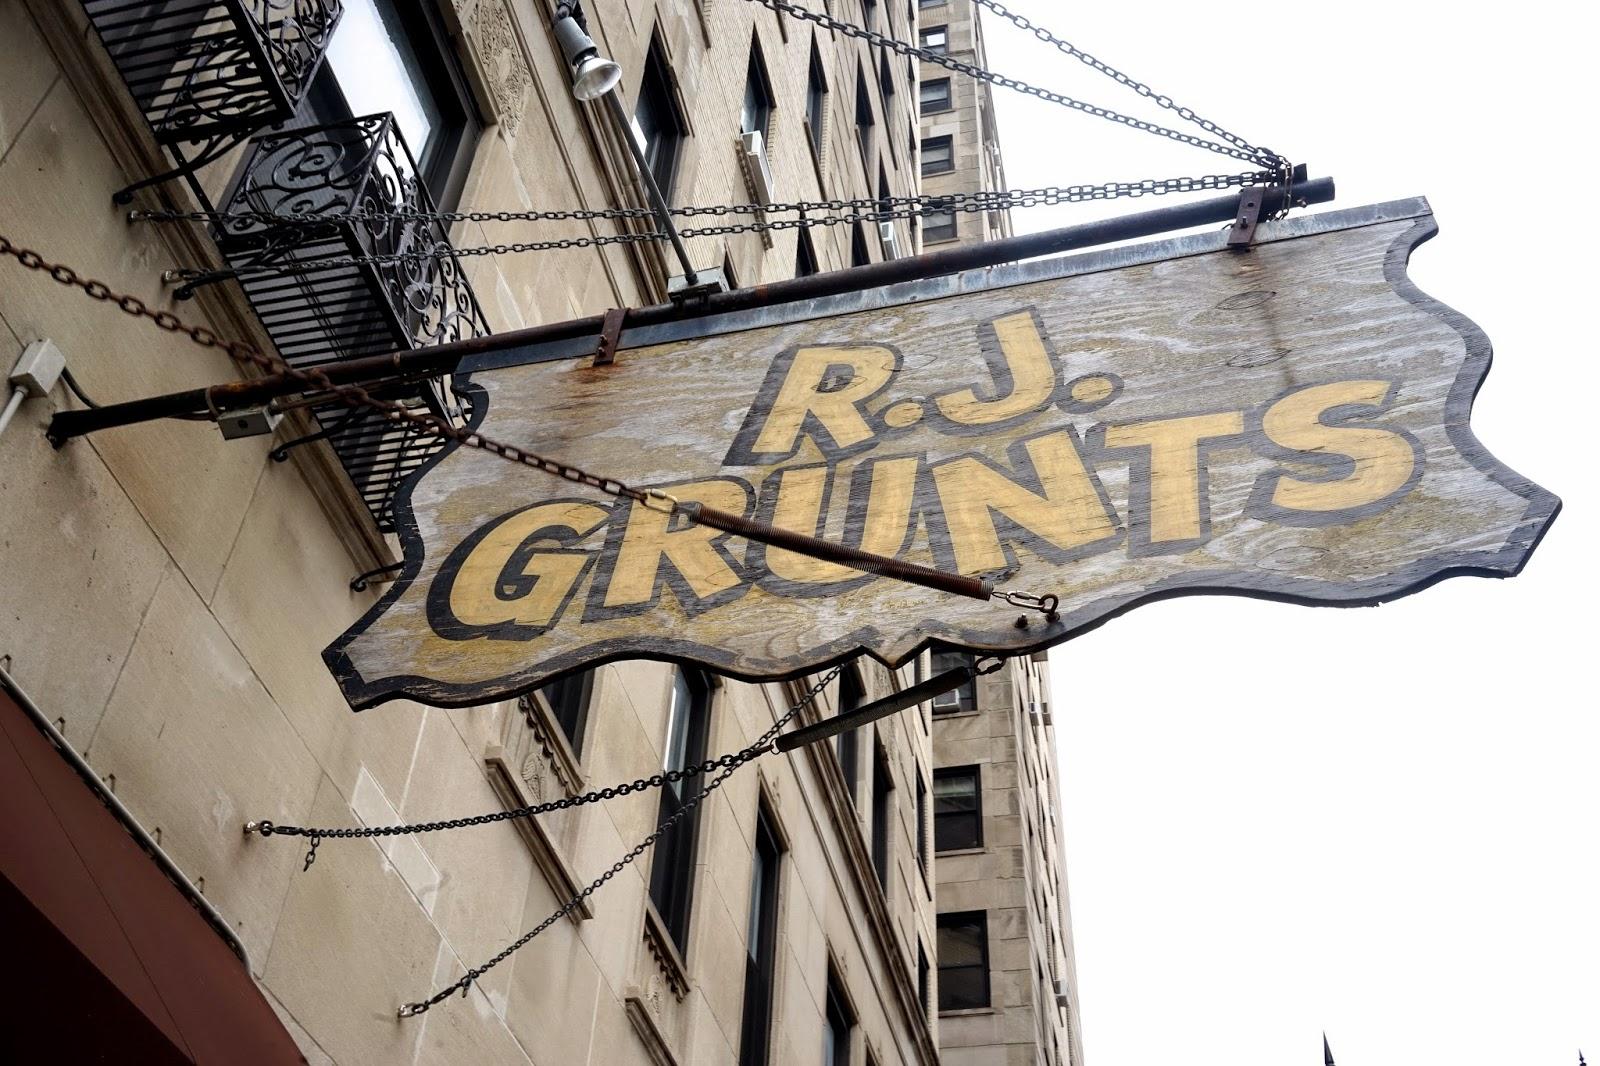 RJ grunts